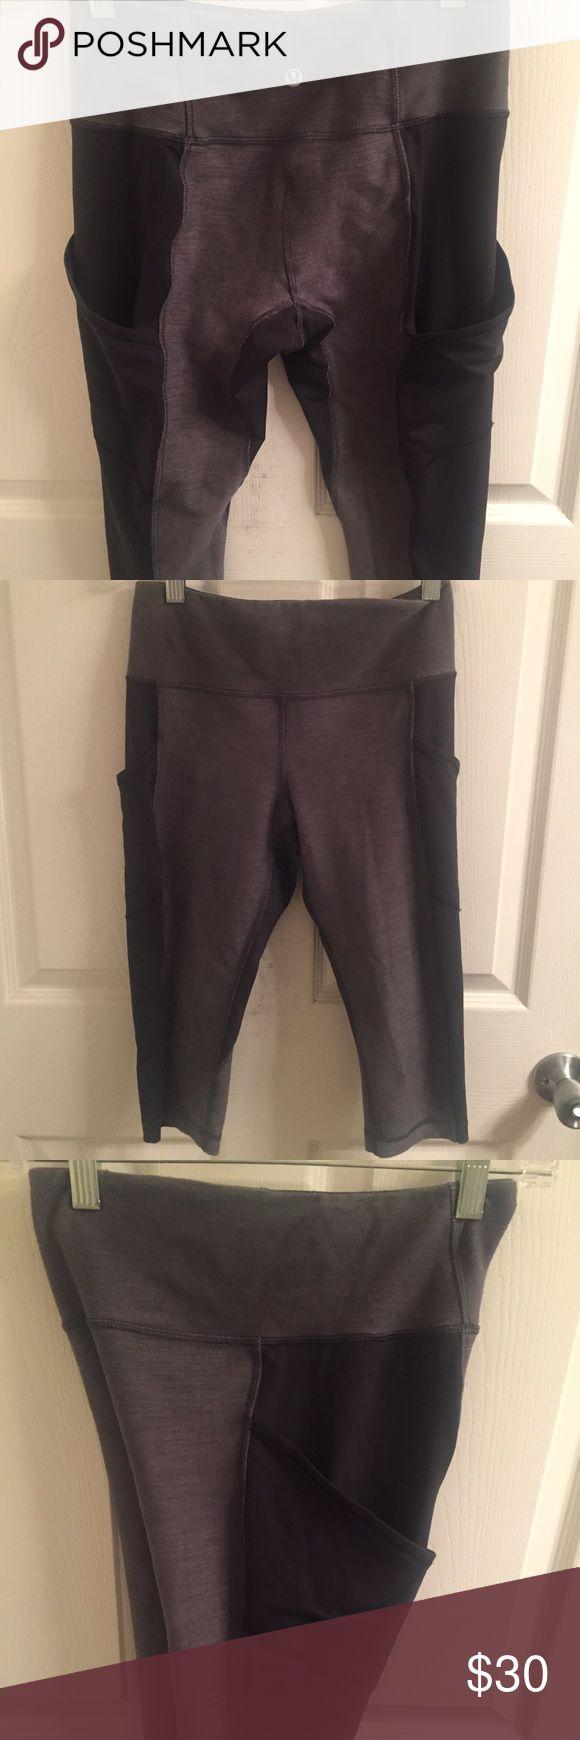 Lululemon crop pants Gray and black lulu knee length cropped pants. Pockets on side of leg. lululemon athletica Pants Track Pants & Joggers